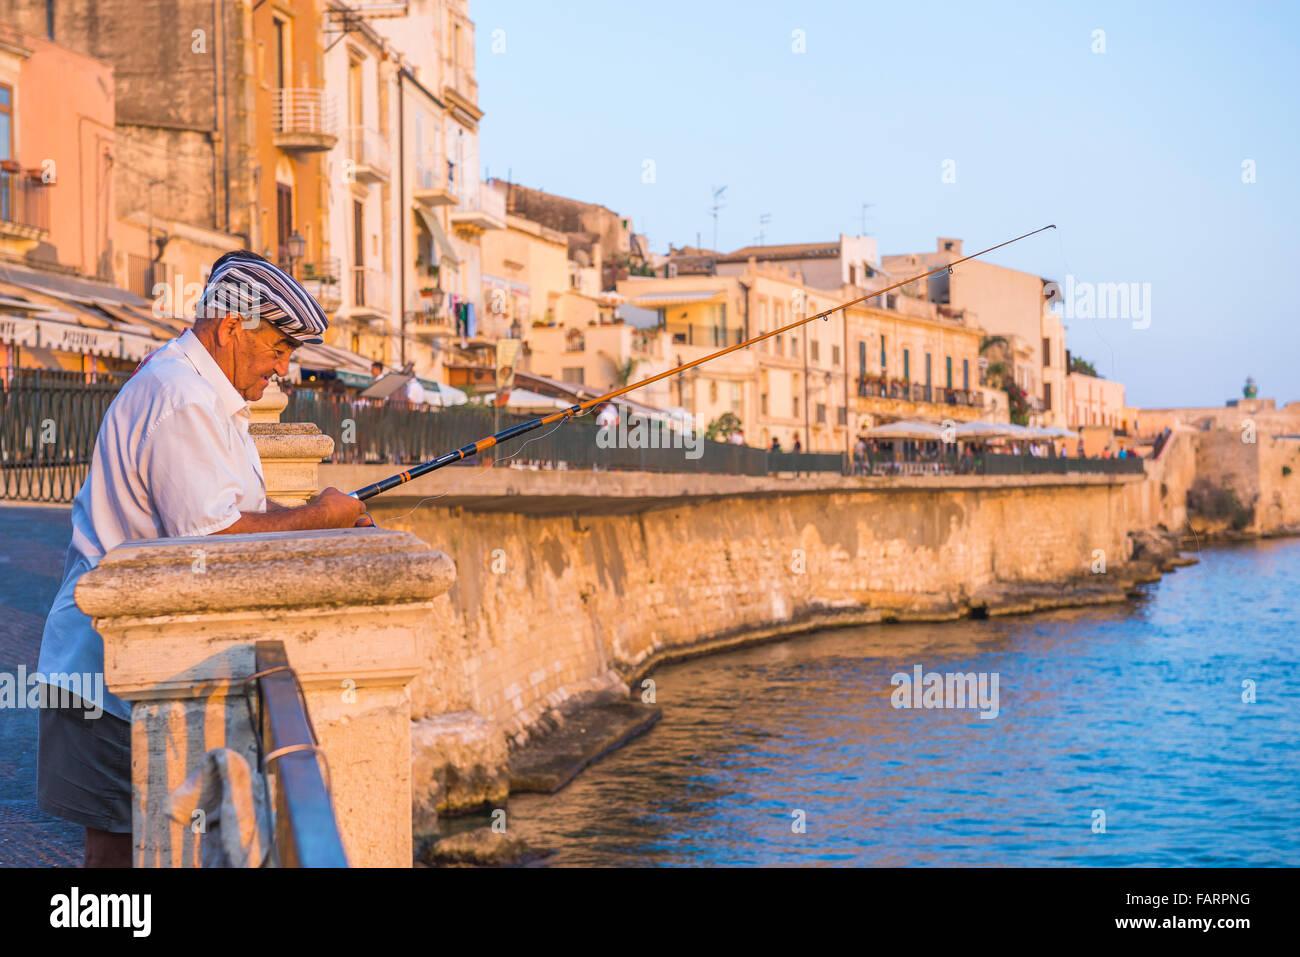 man-fishing-sicily-at-sunset-a-man-fishe